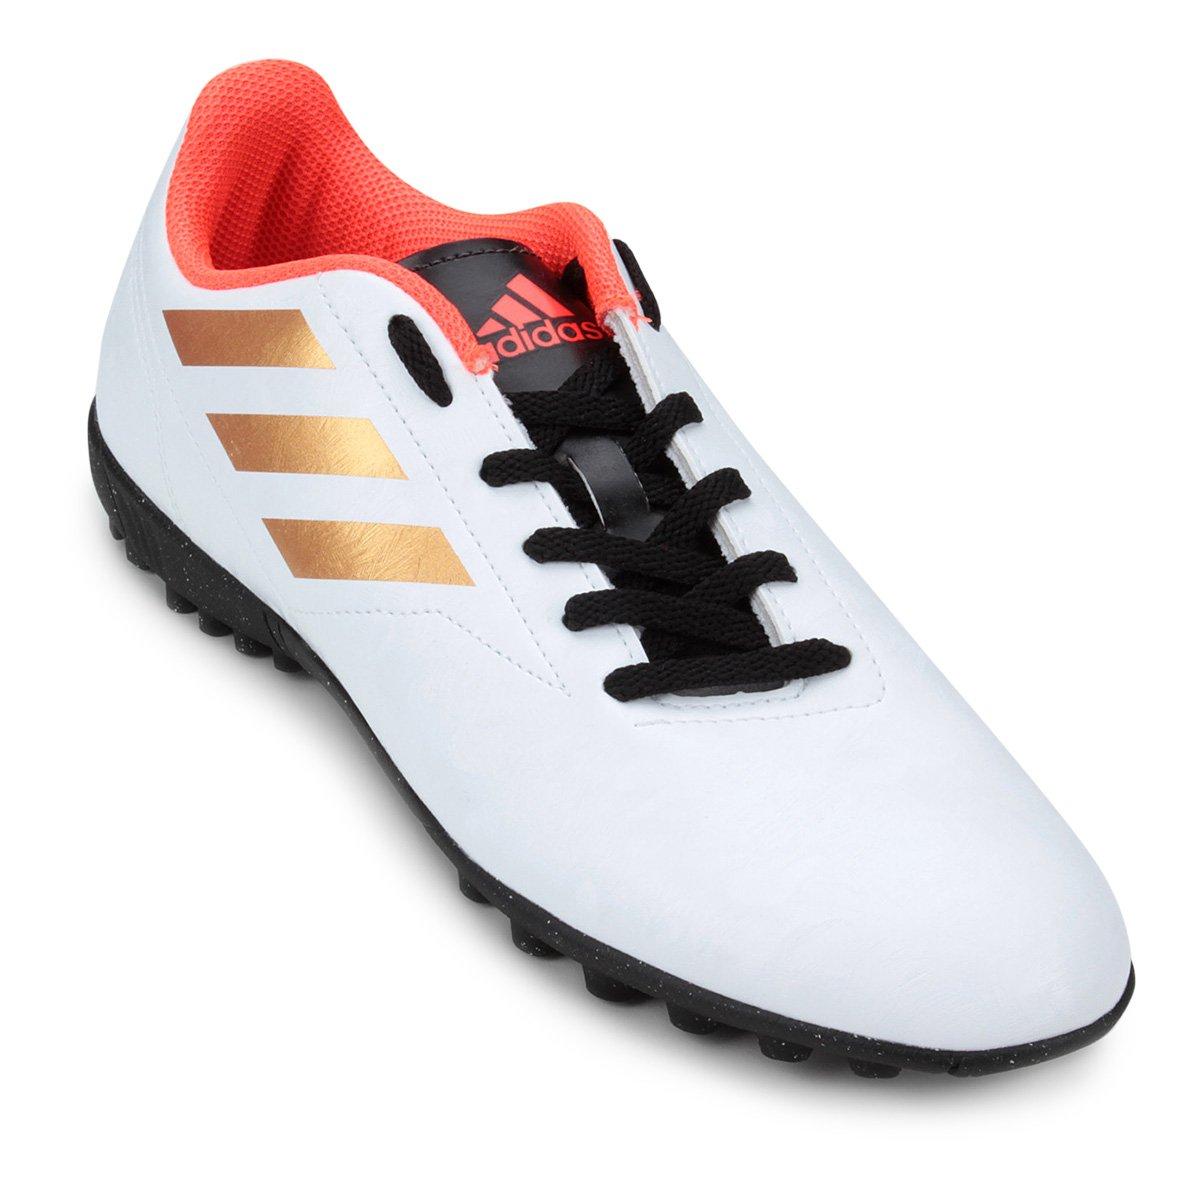 73adf66d11 Chuteira Adidas Conquisto II Society TF - Branco e Laranja